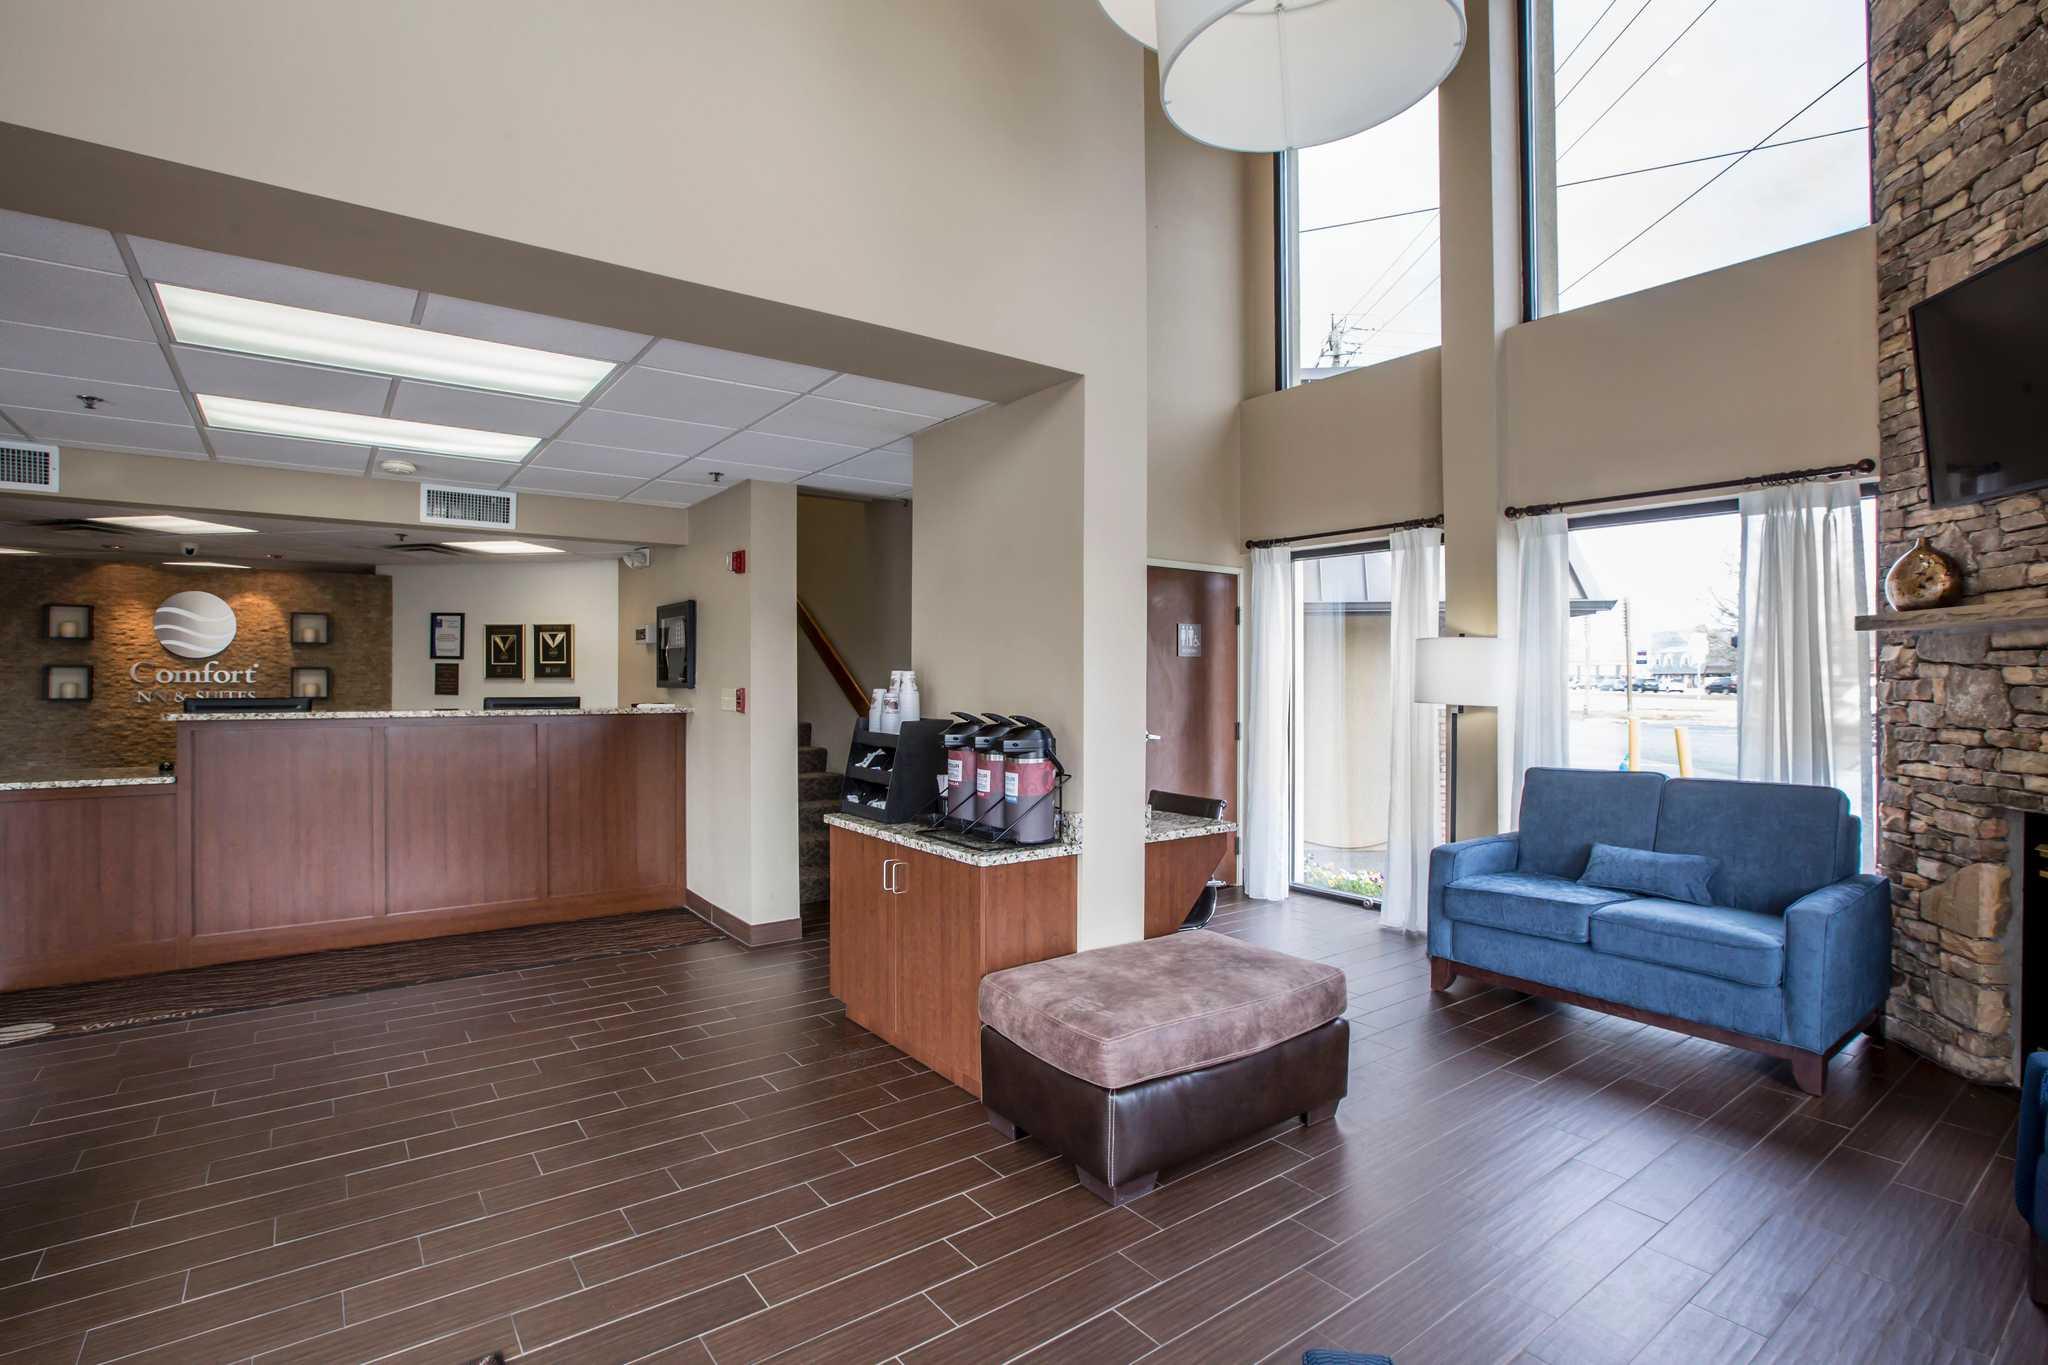 Comfort Inn & Suites at Dollywood Lane image 15